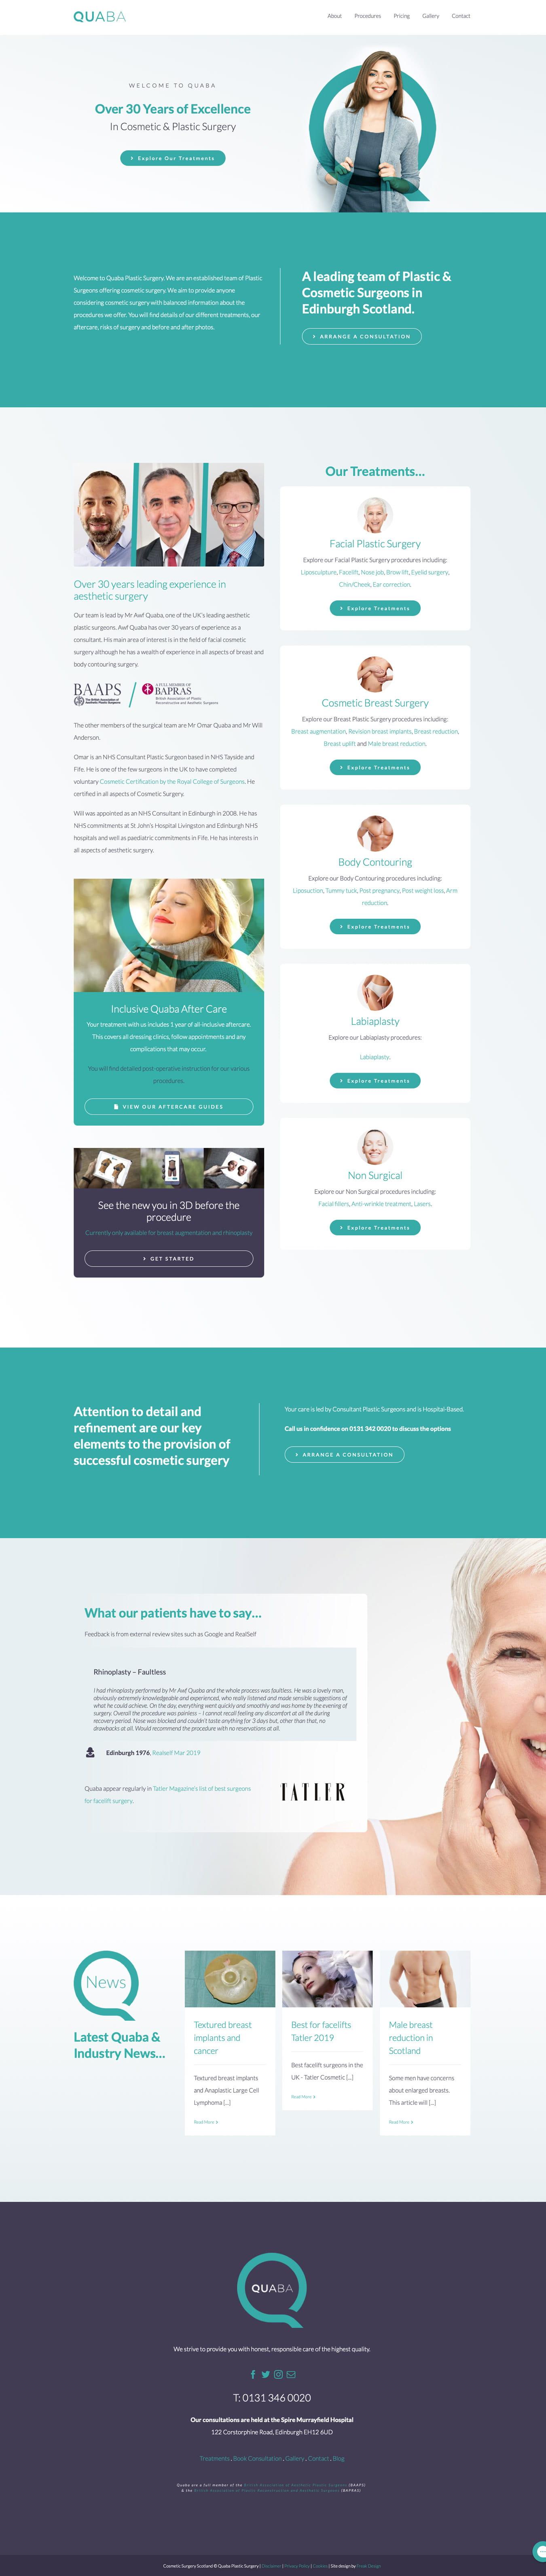 Quaba Plastic Surgery Website Design